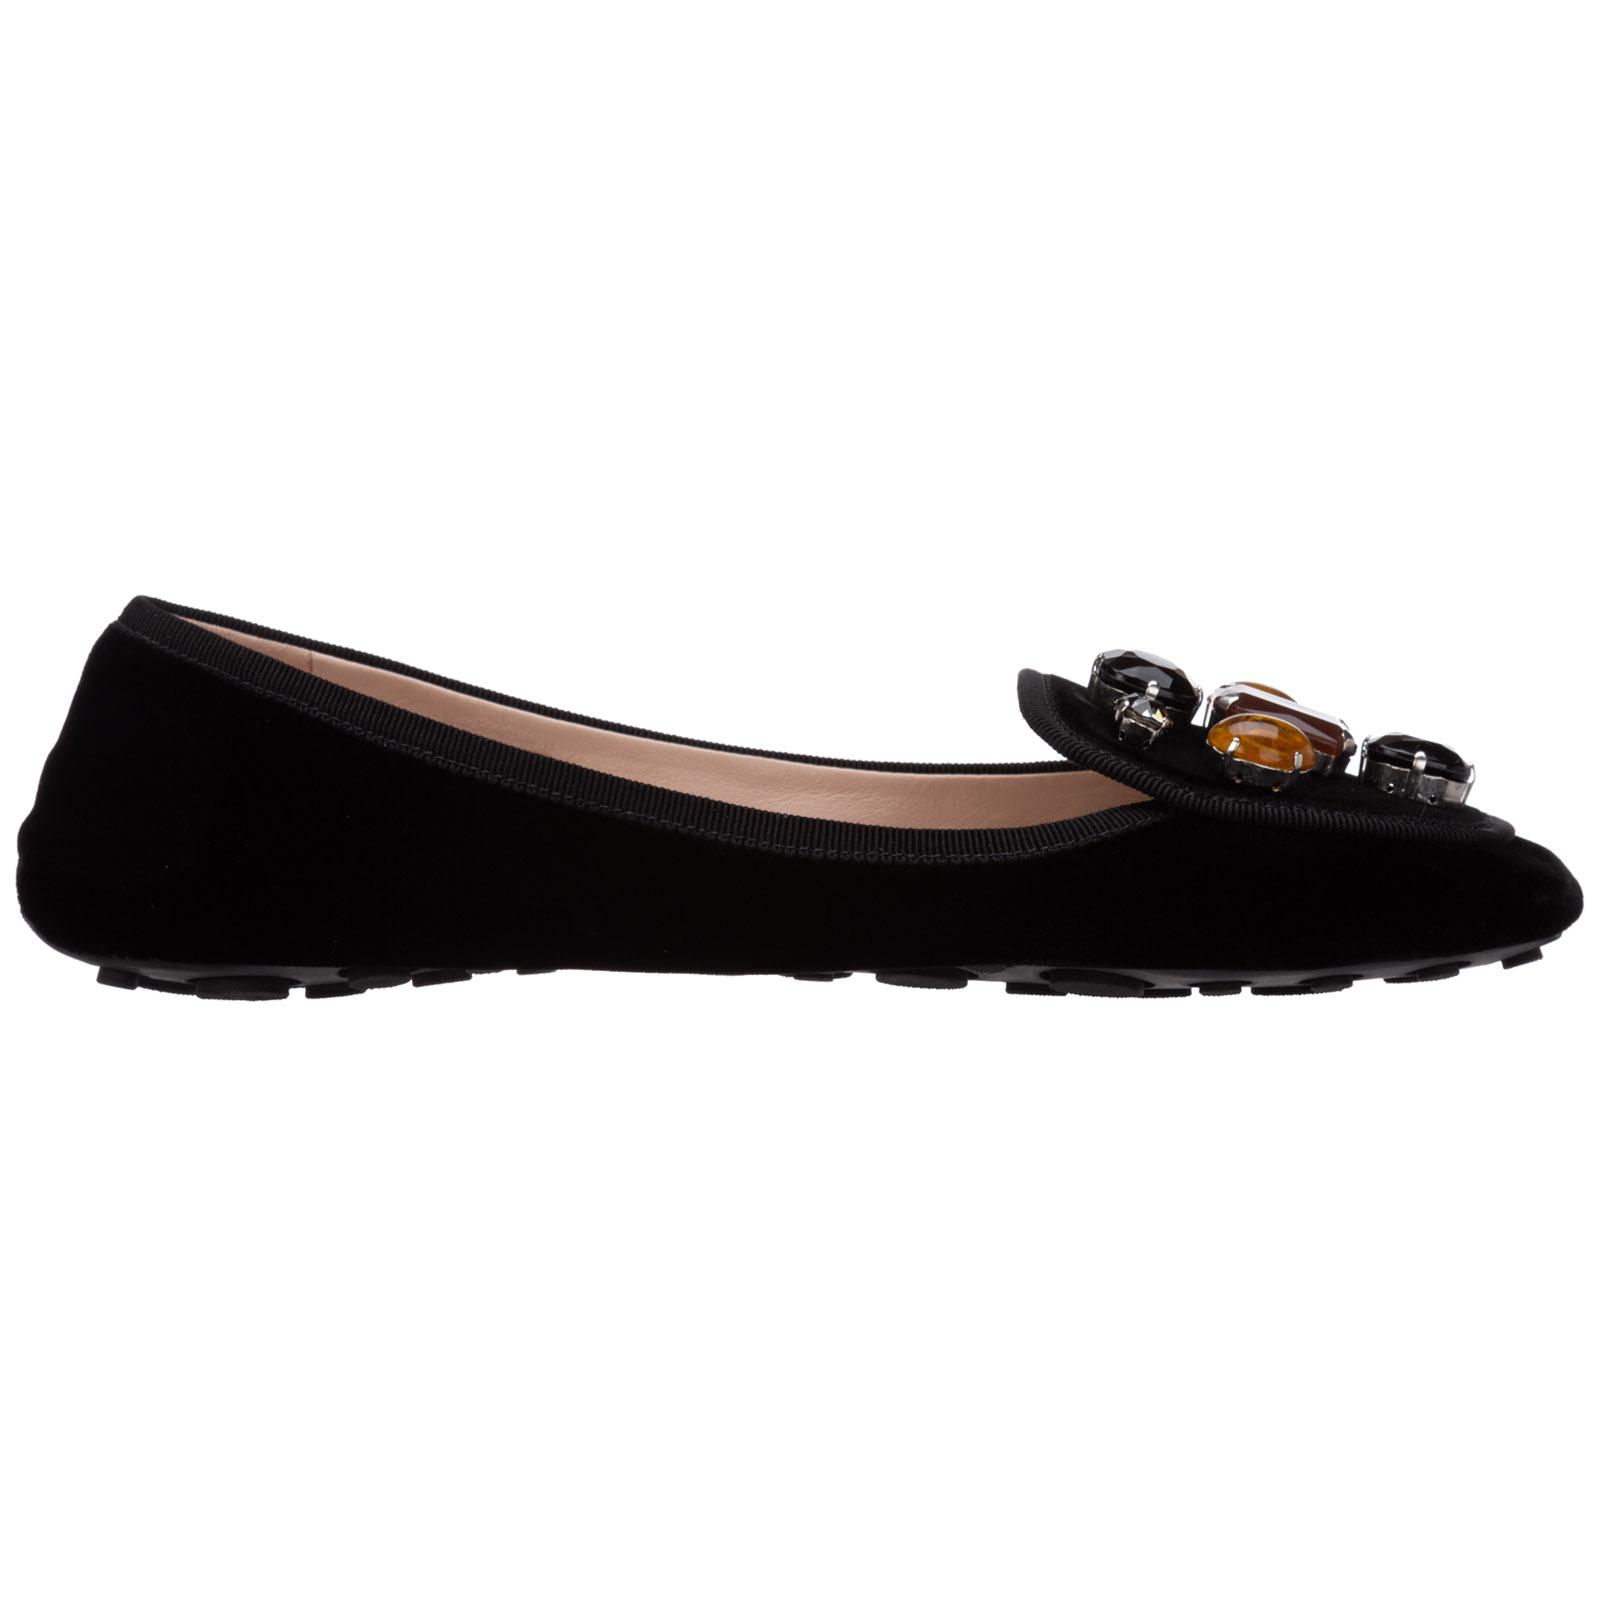 Car Shoe Women's ballet flats ballerinas  - Black - Size: 37.5